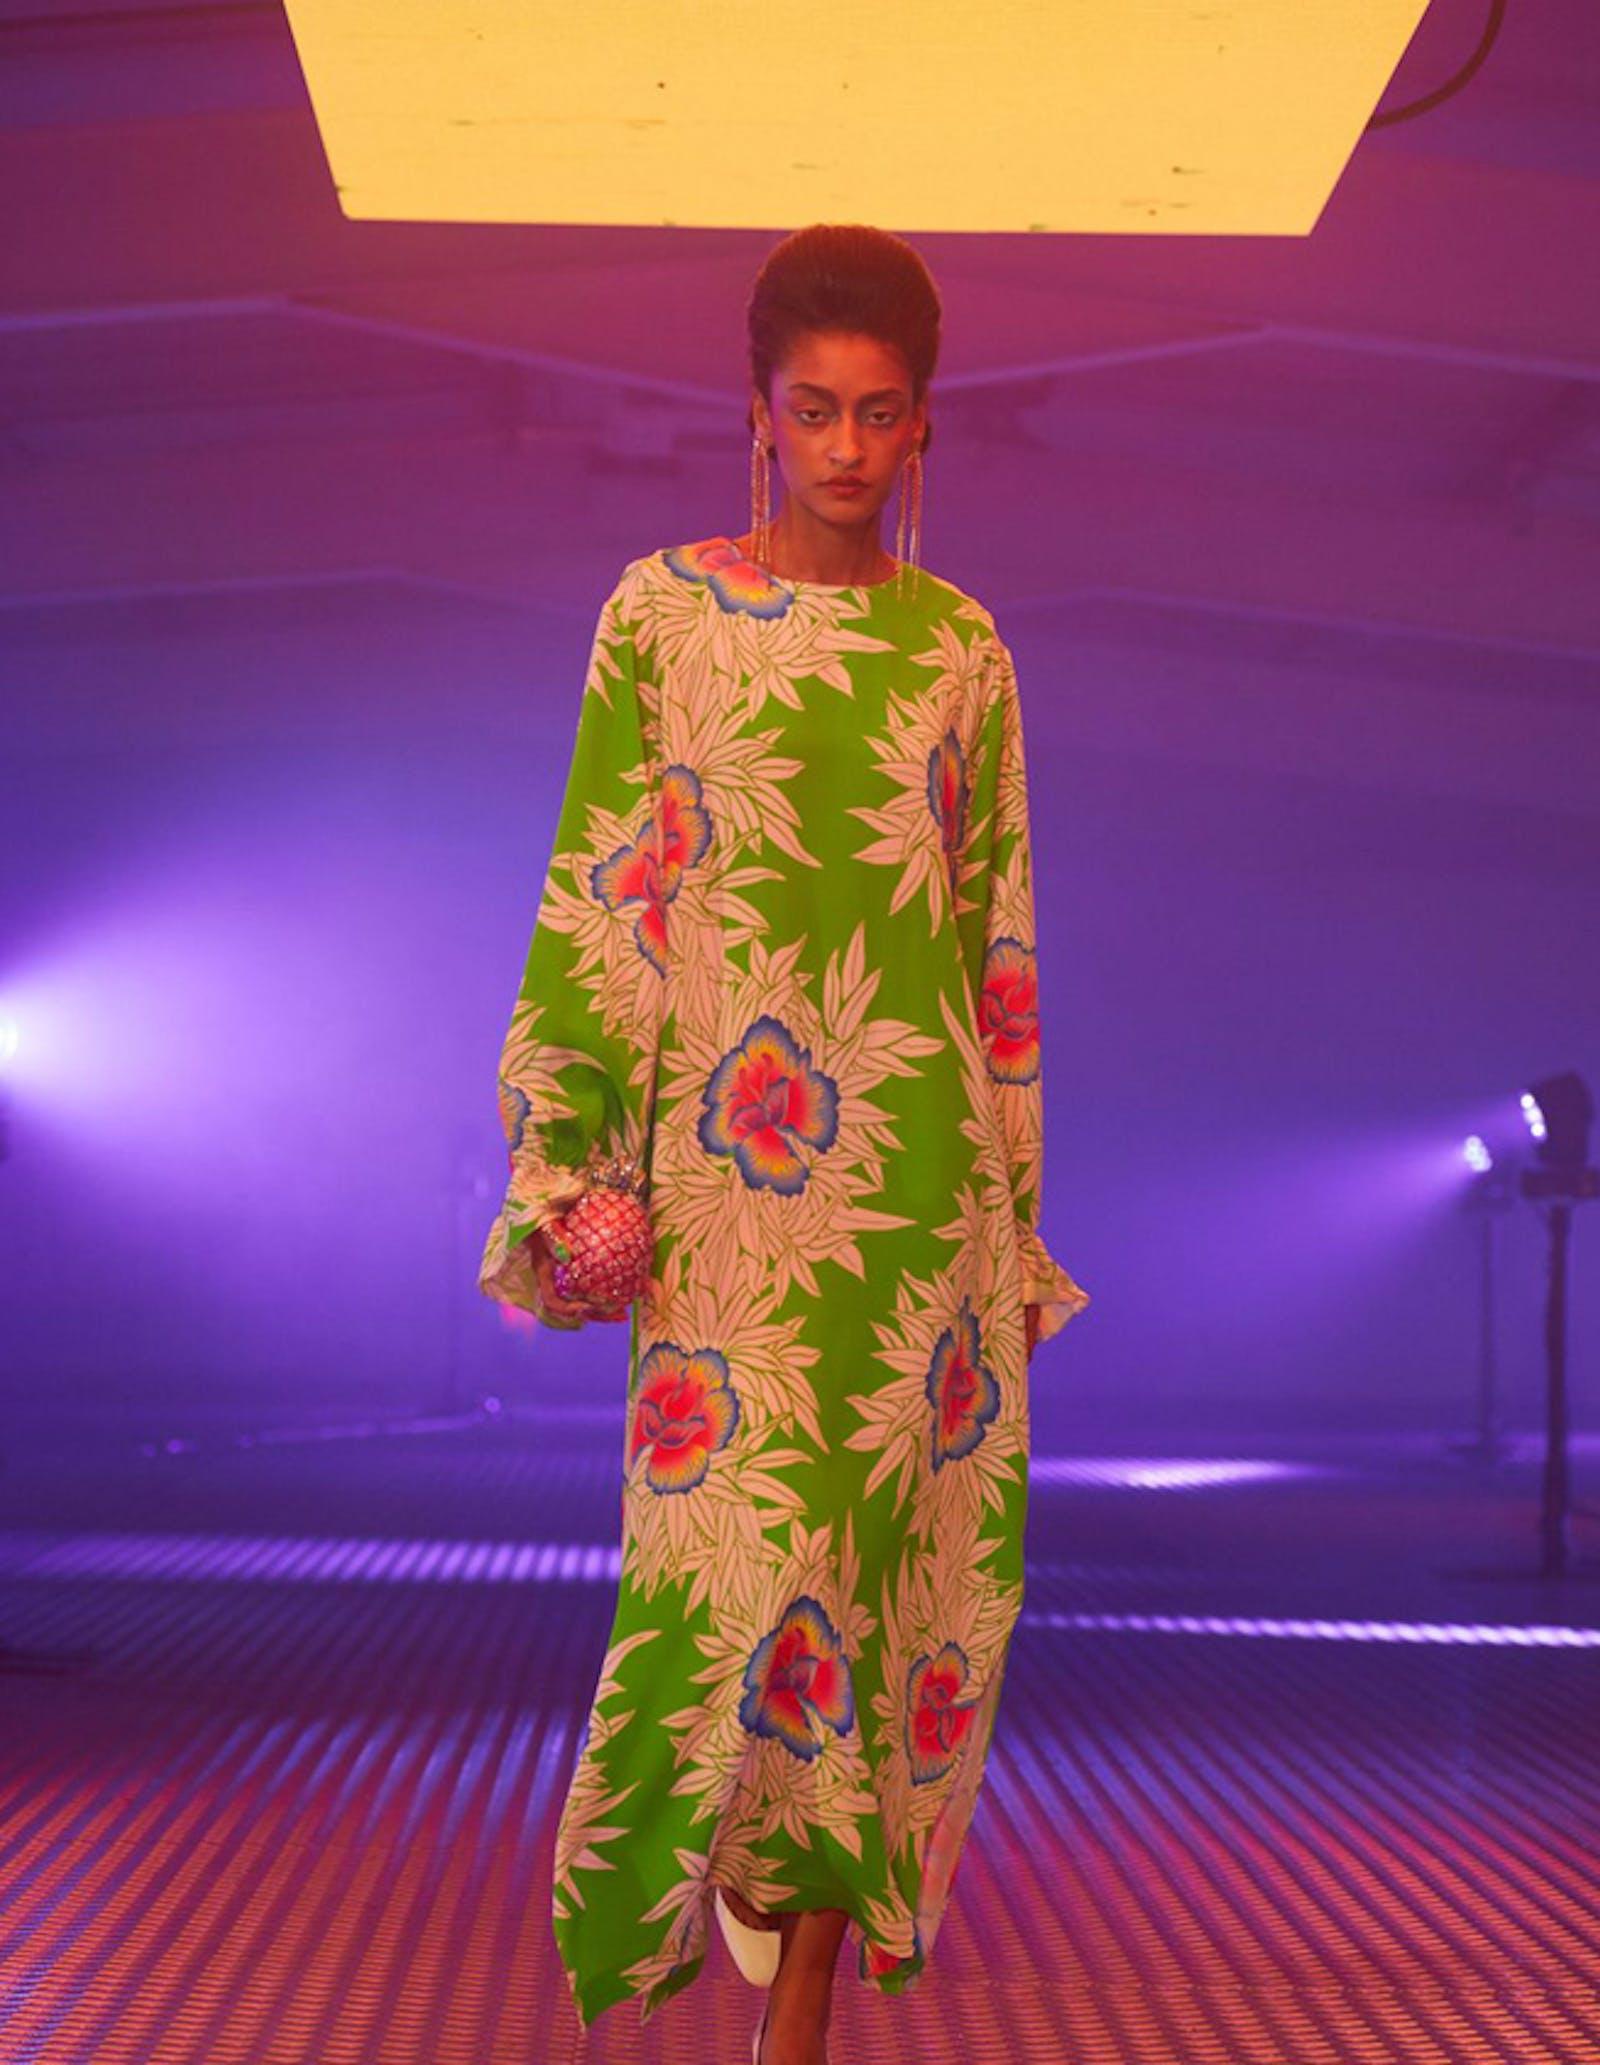 London fashion week shot of woman wearing floral exotic flower print on her dress